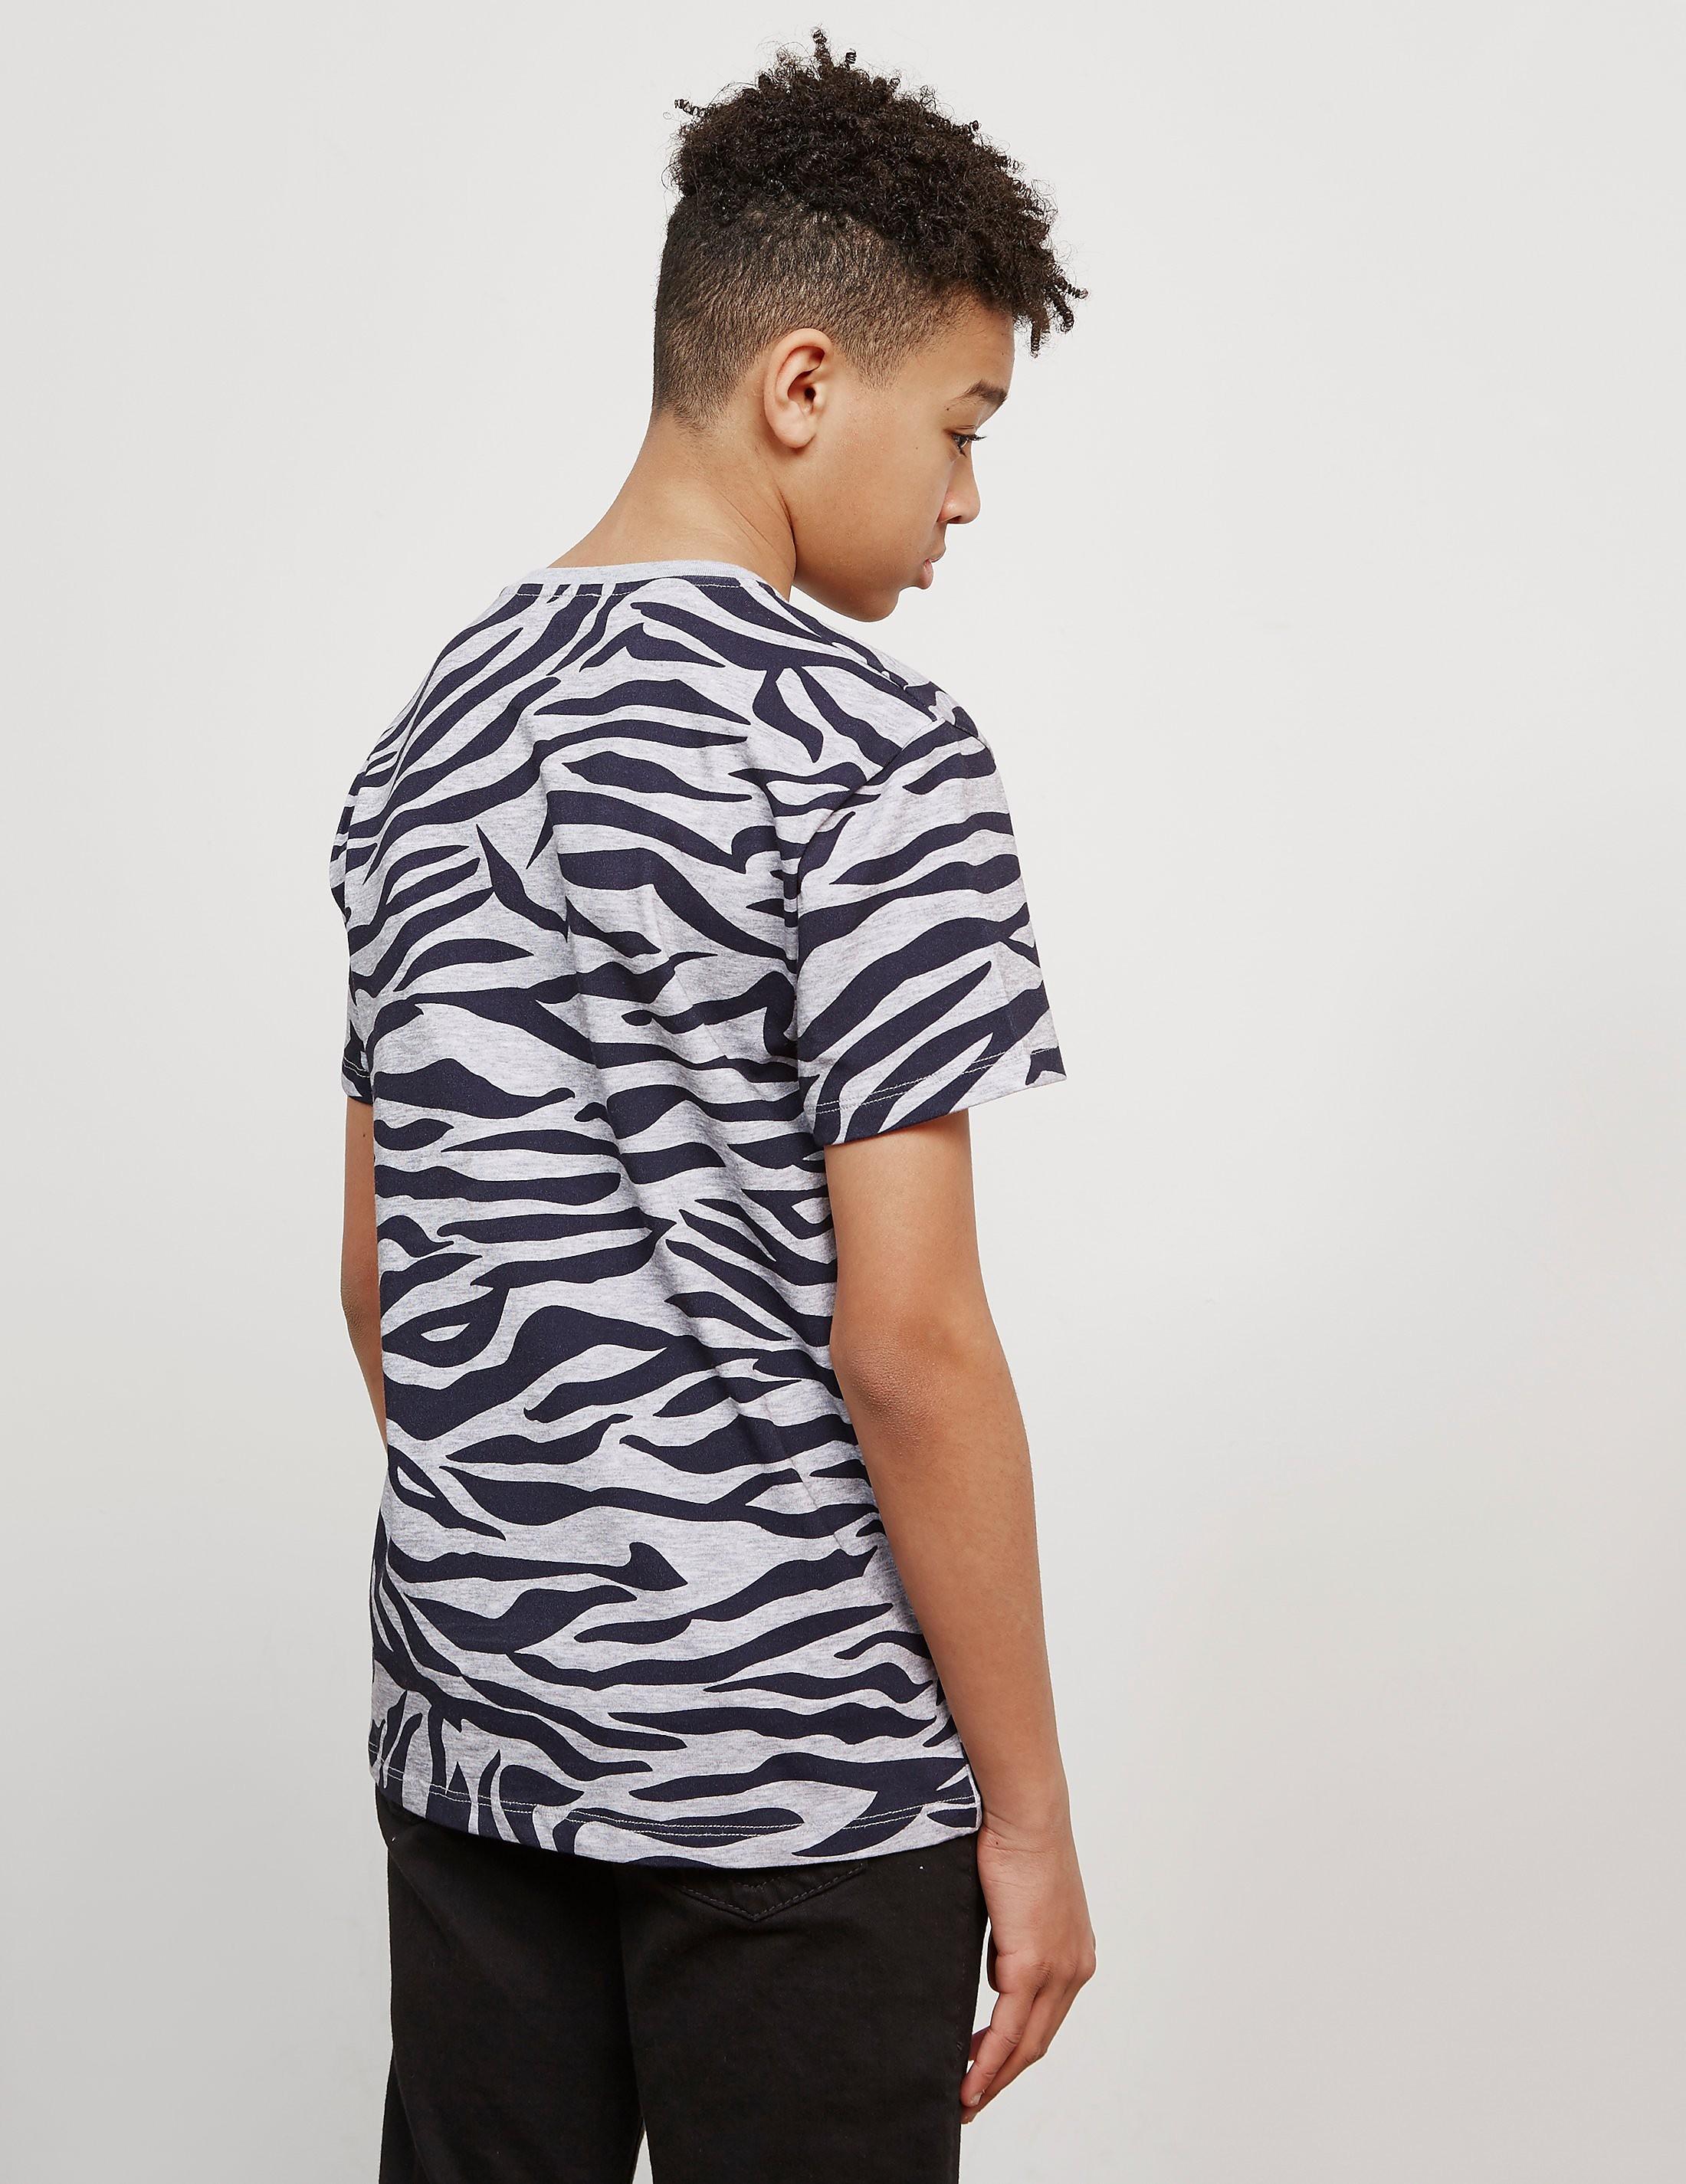 KENZO Camo Tiger Short Sleeve T-Shirt